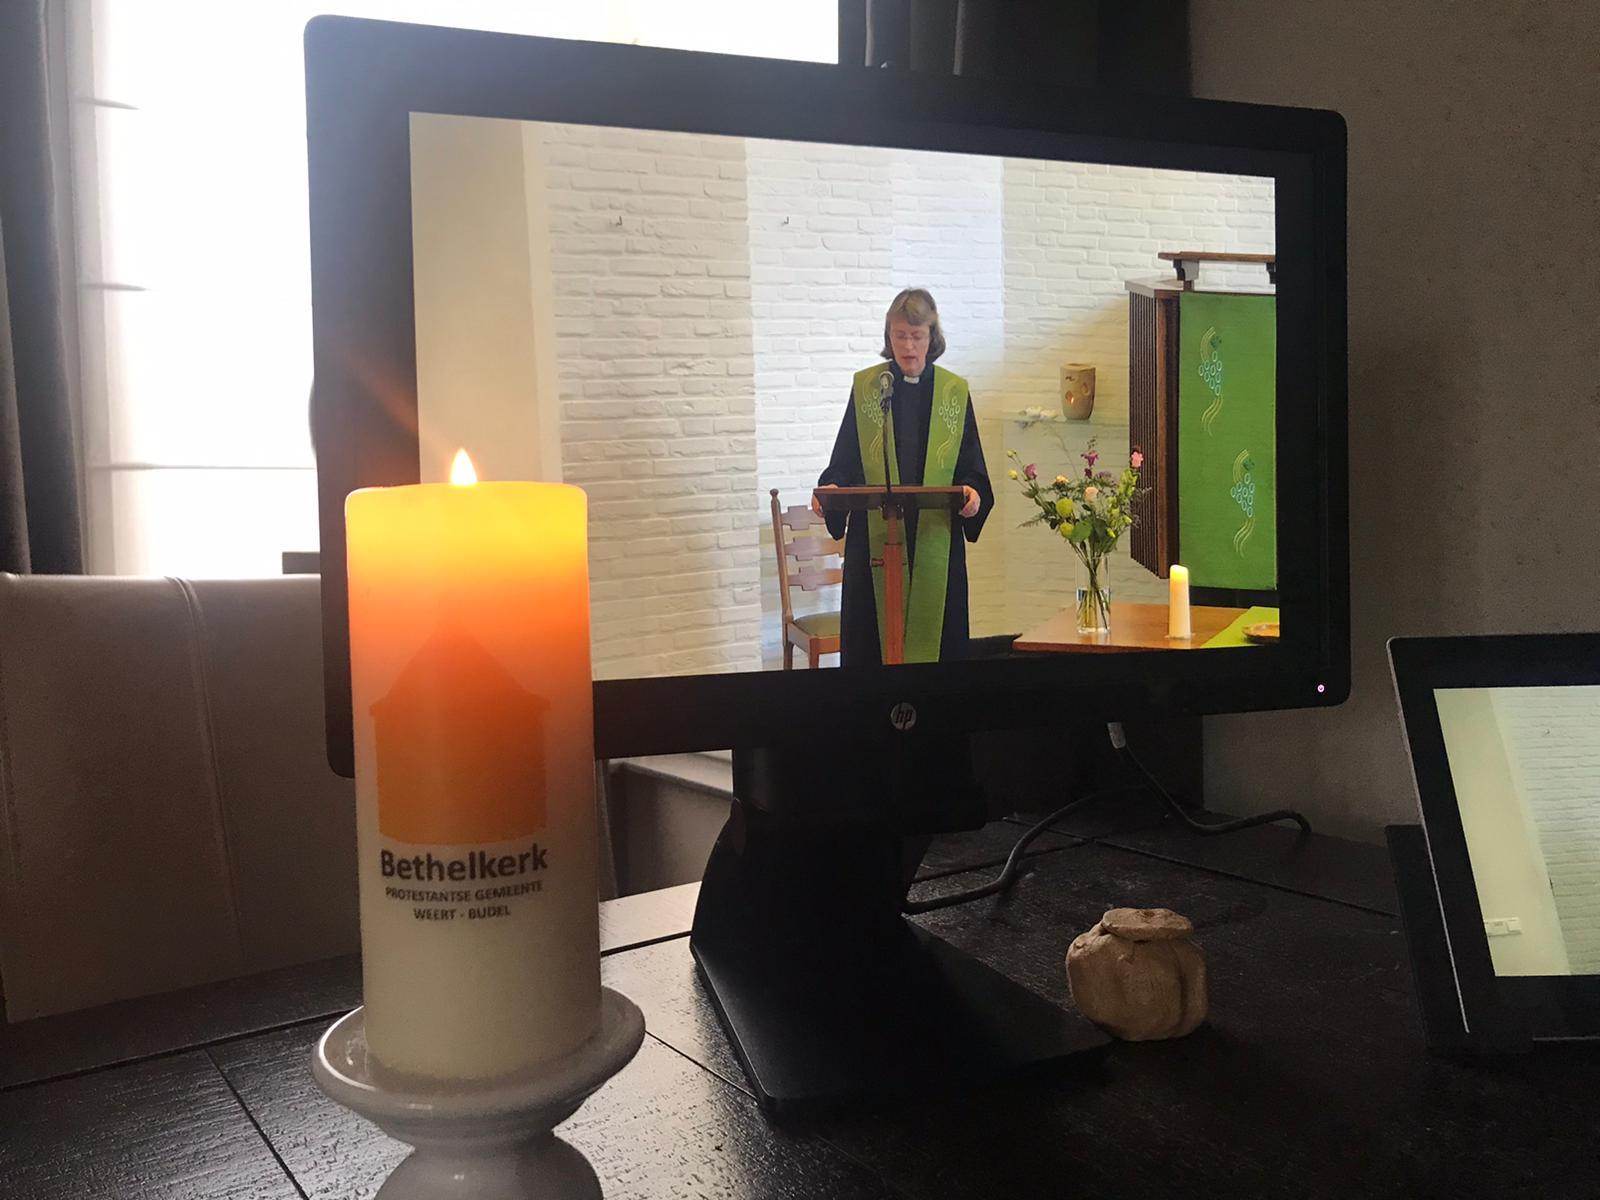 Online kerkdienst